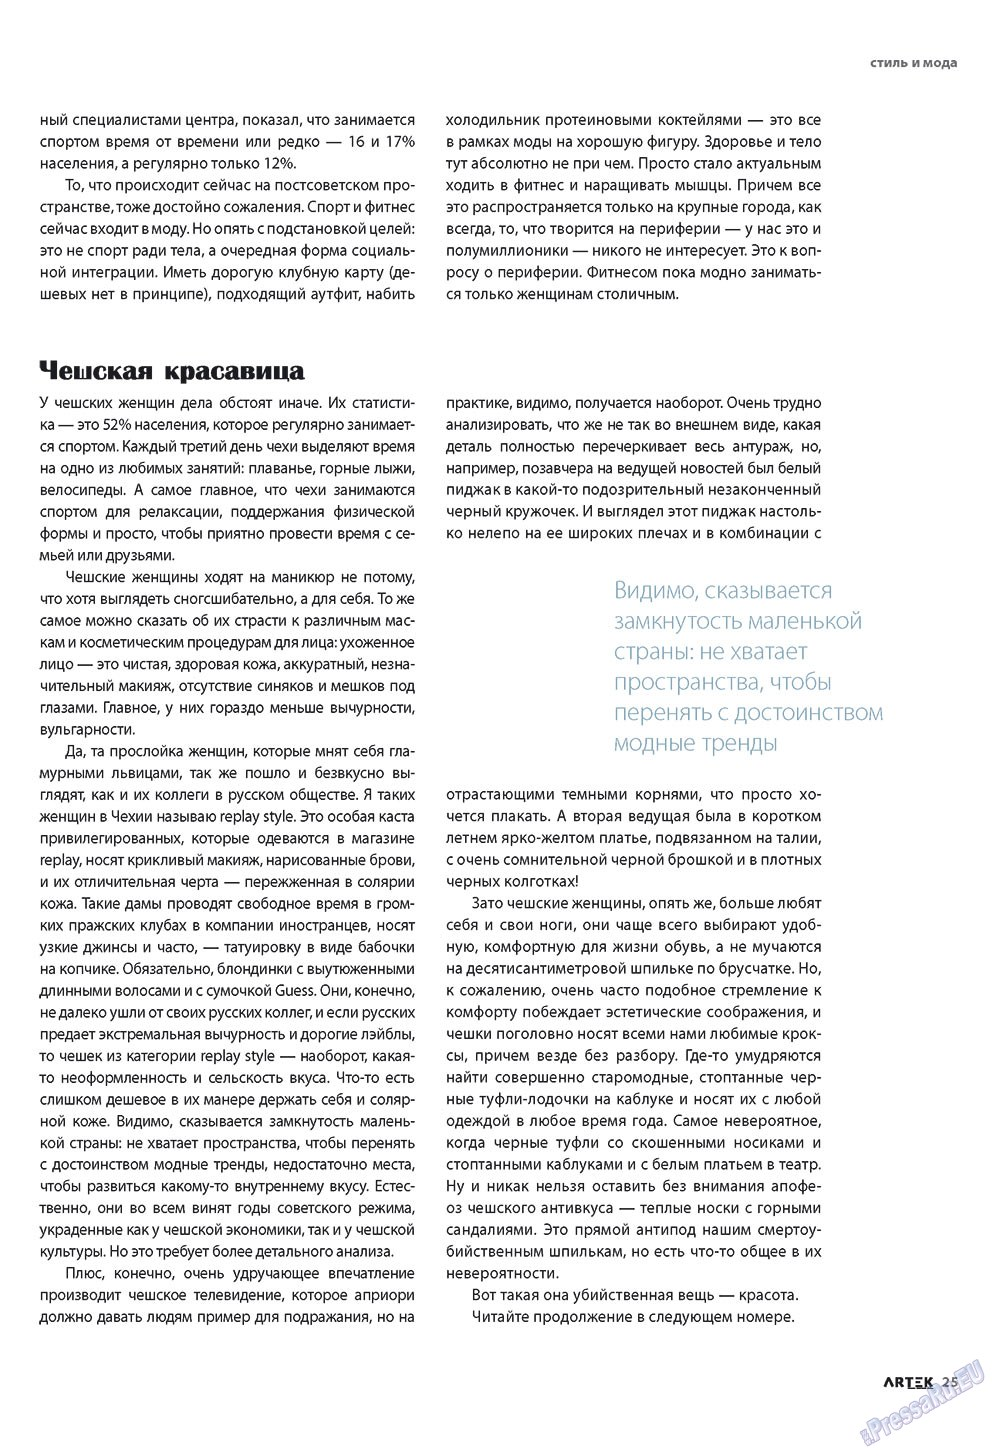 Артек (журнал). 2009 год, номер 4, стр. 25